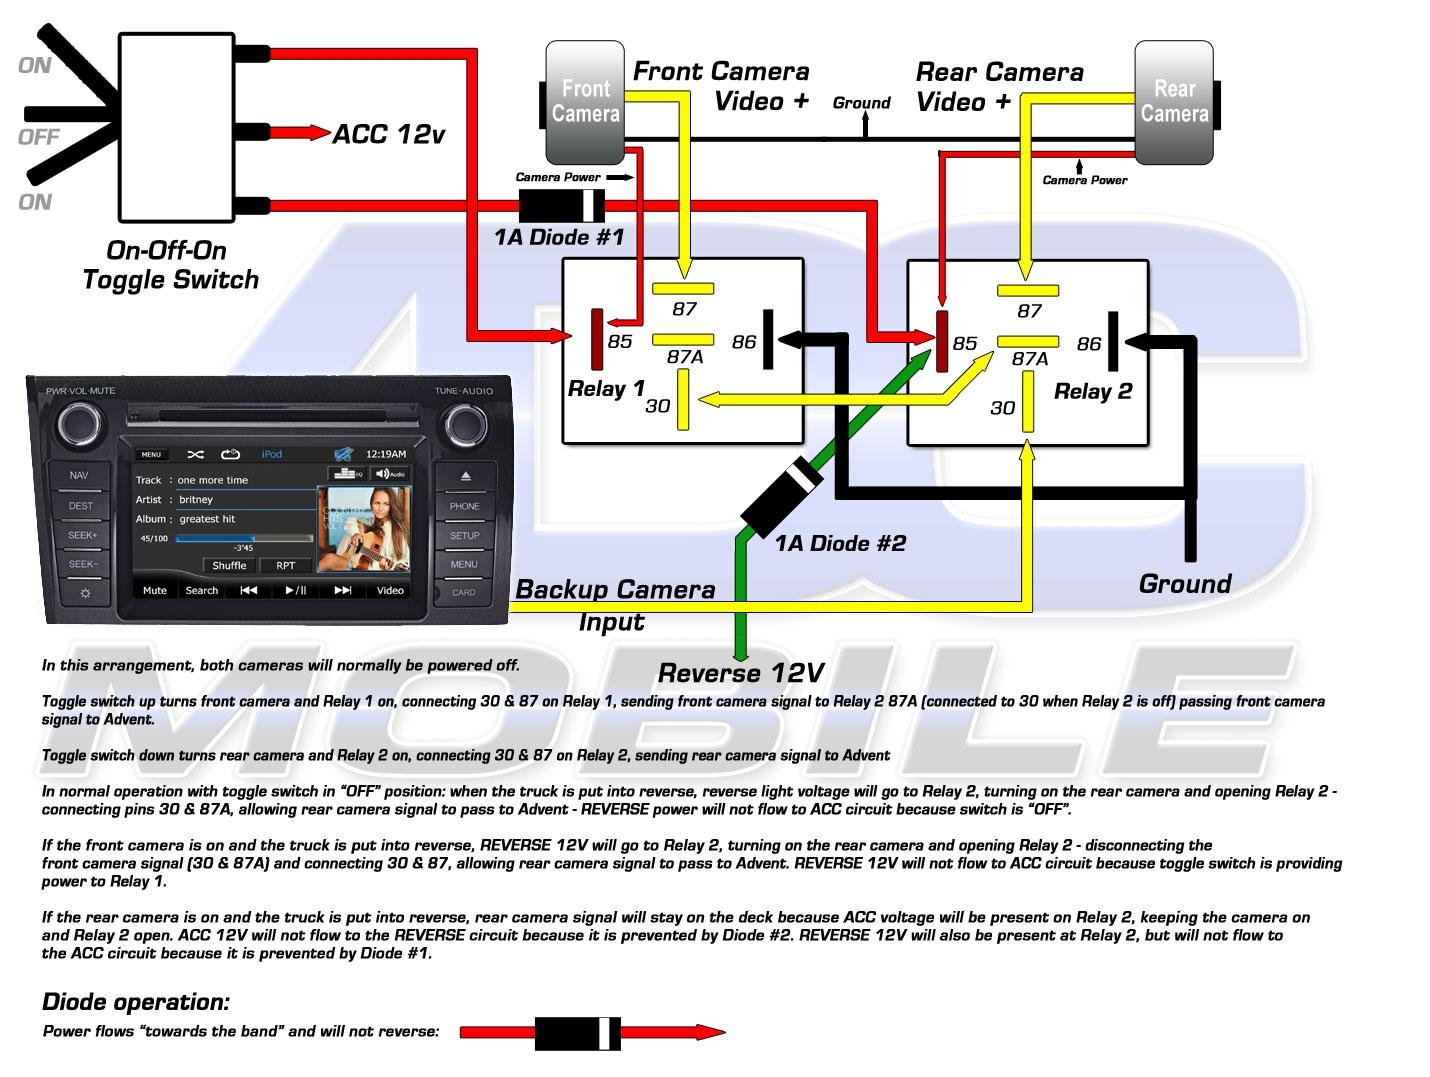 toyota tundra backup camera wiring diagram Download-2014 Tundra Backup Camera Wiring Diagram Wiring Diagram • Dorable Voyager Backup Camera Wiring Diagram 15-r